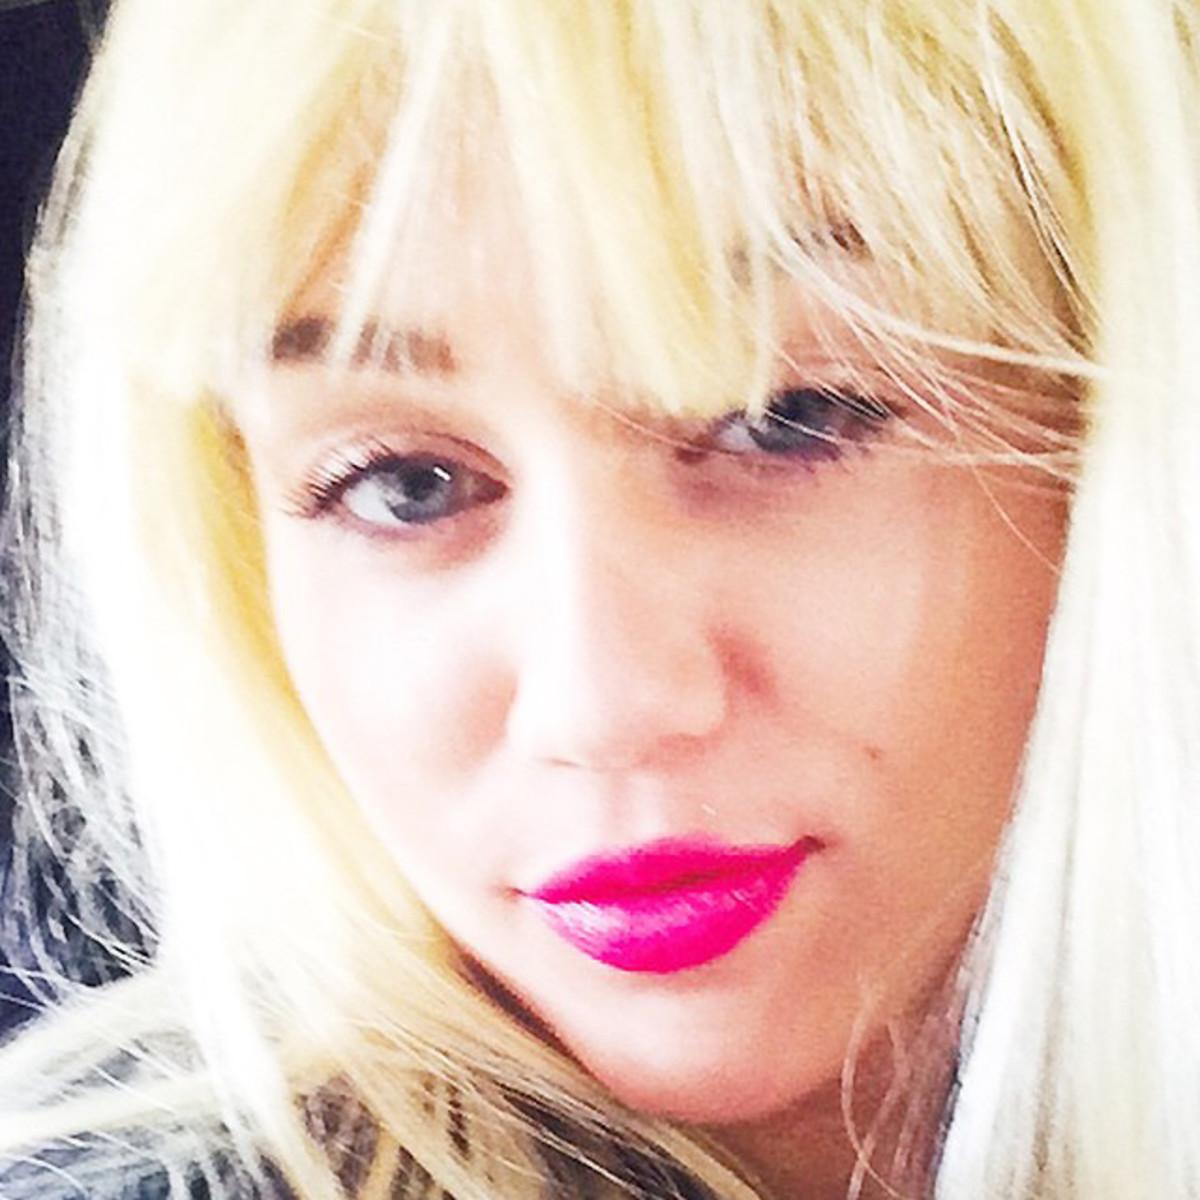 MAC Viva Glam Miley Cyrus_Miley Cyrus instagram_imabeautygeek.com